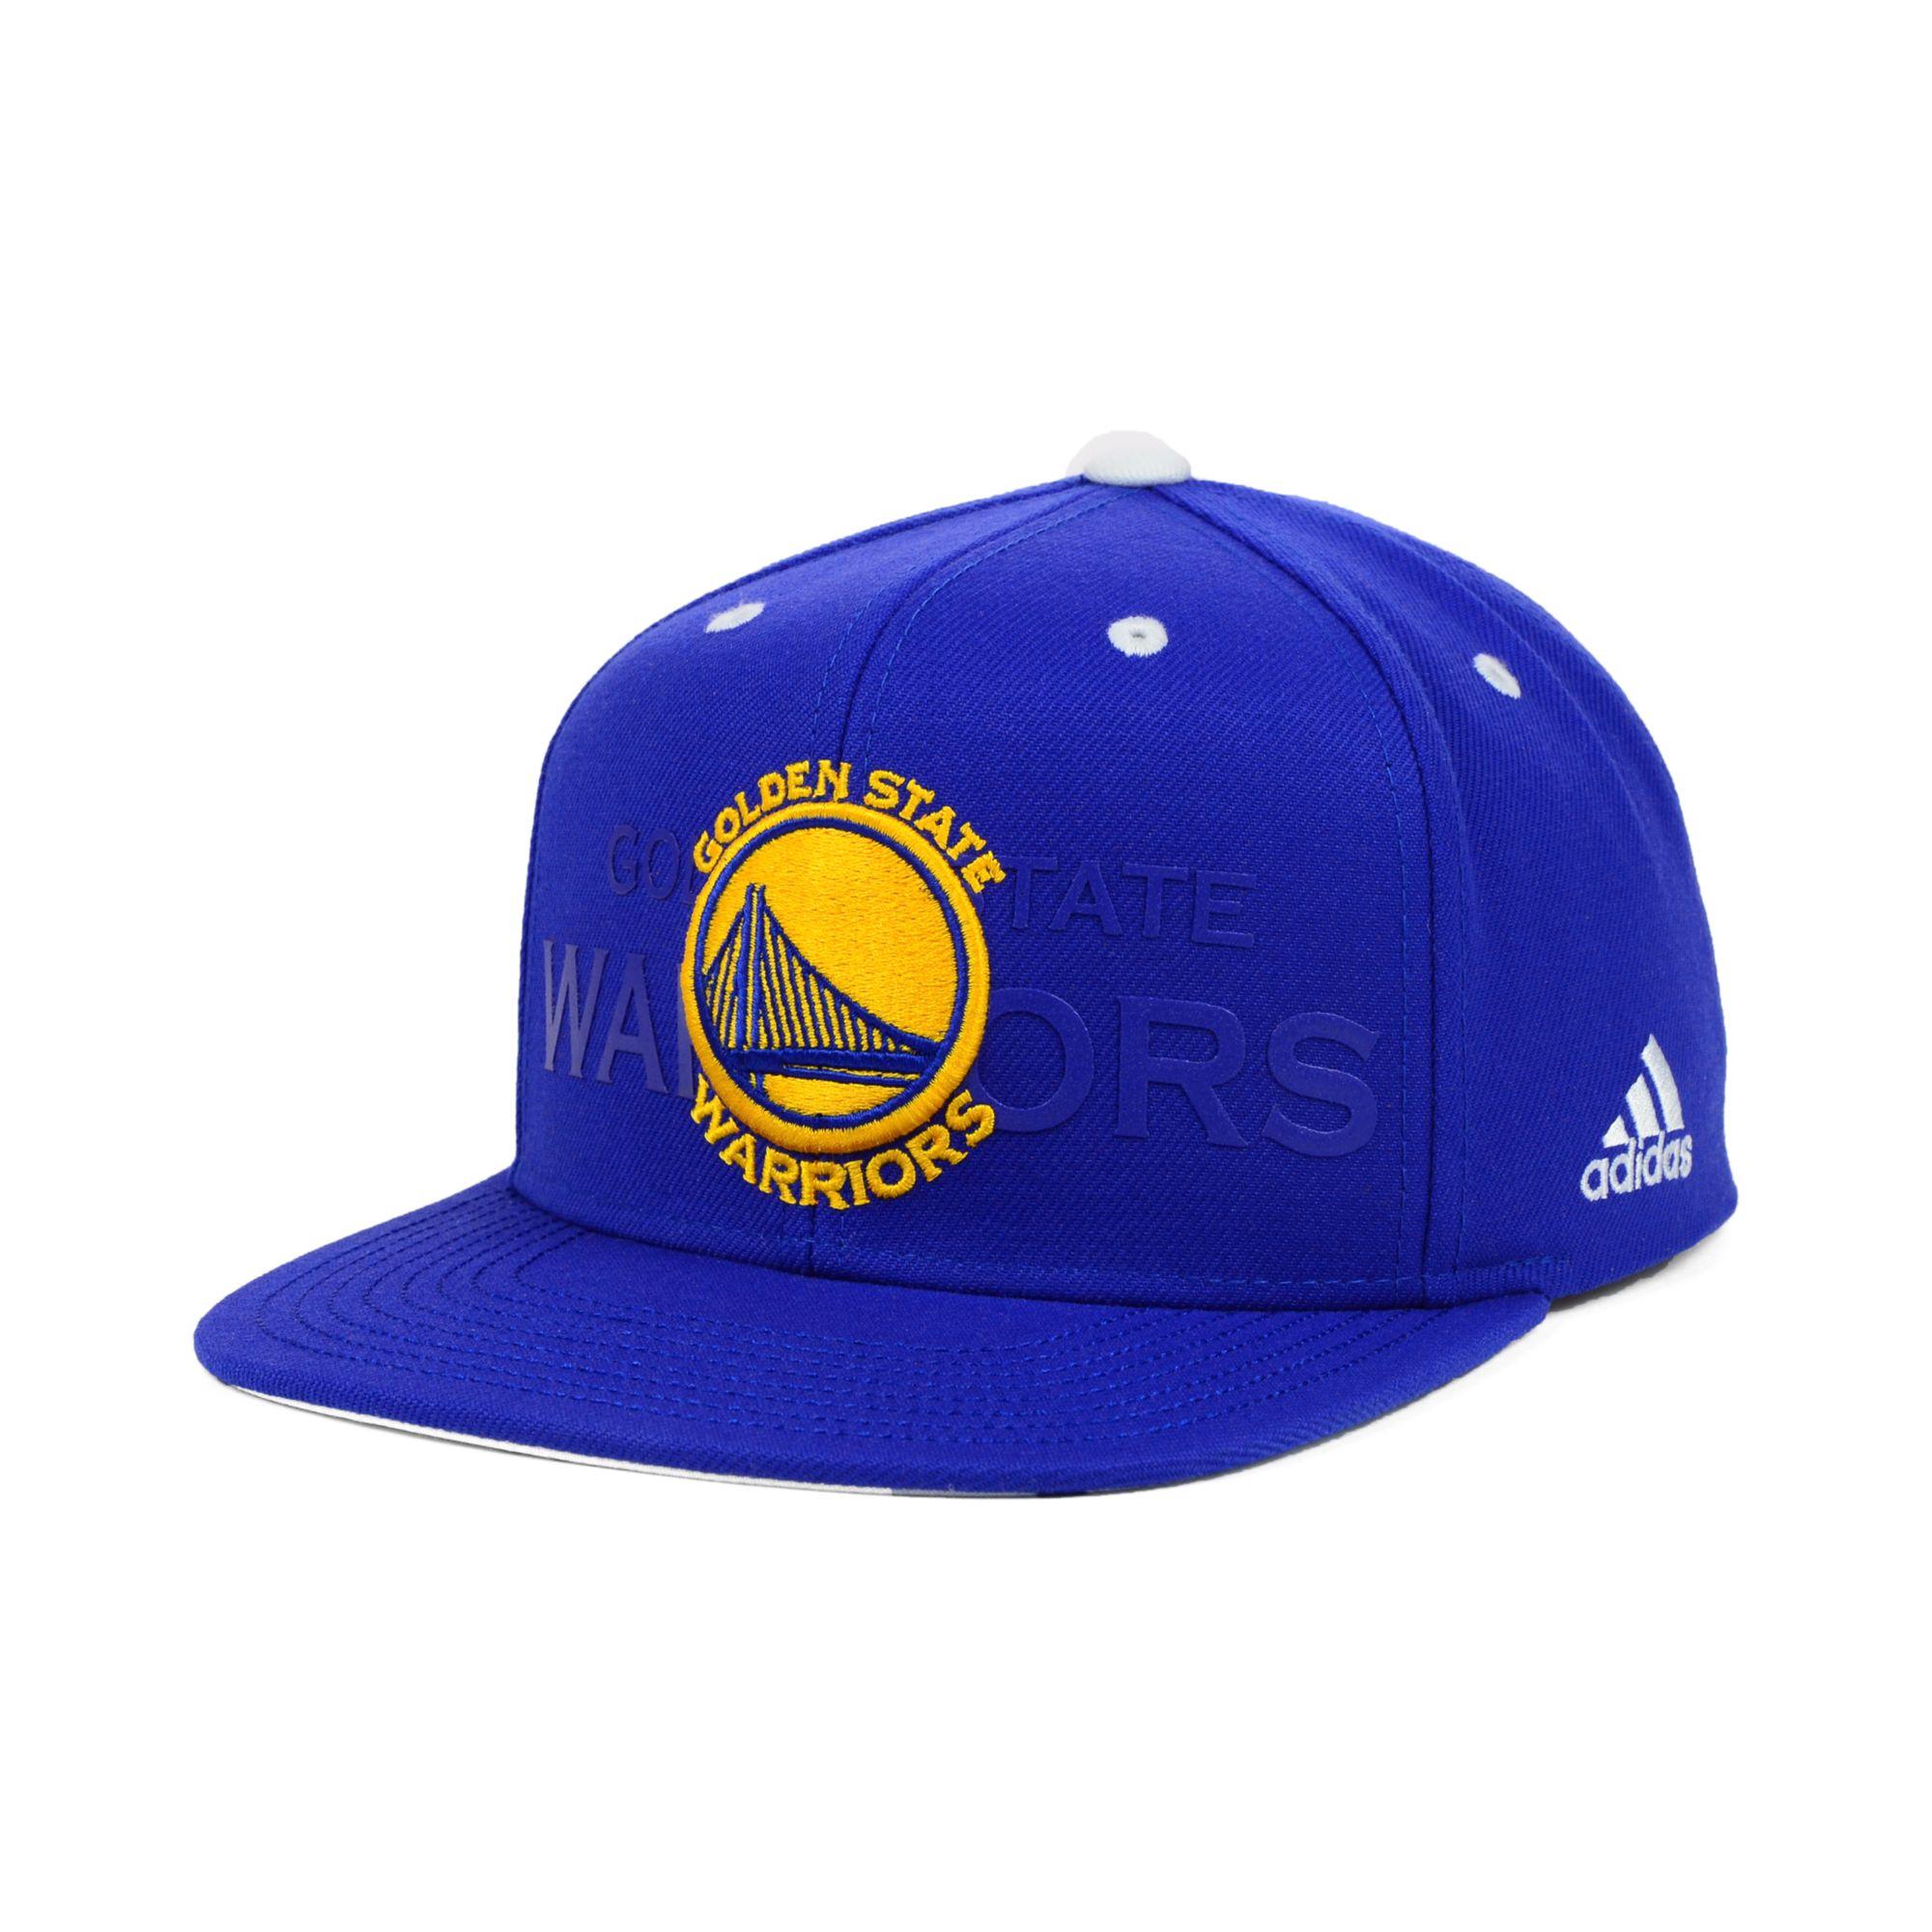 new arrival 8dfc1 c6cb3 ... sweden lyst adidas golden state warriors nba draft snapback cap in blue  45d38 88bb8